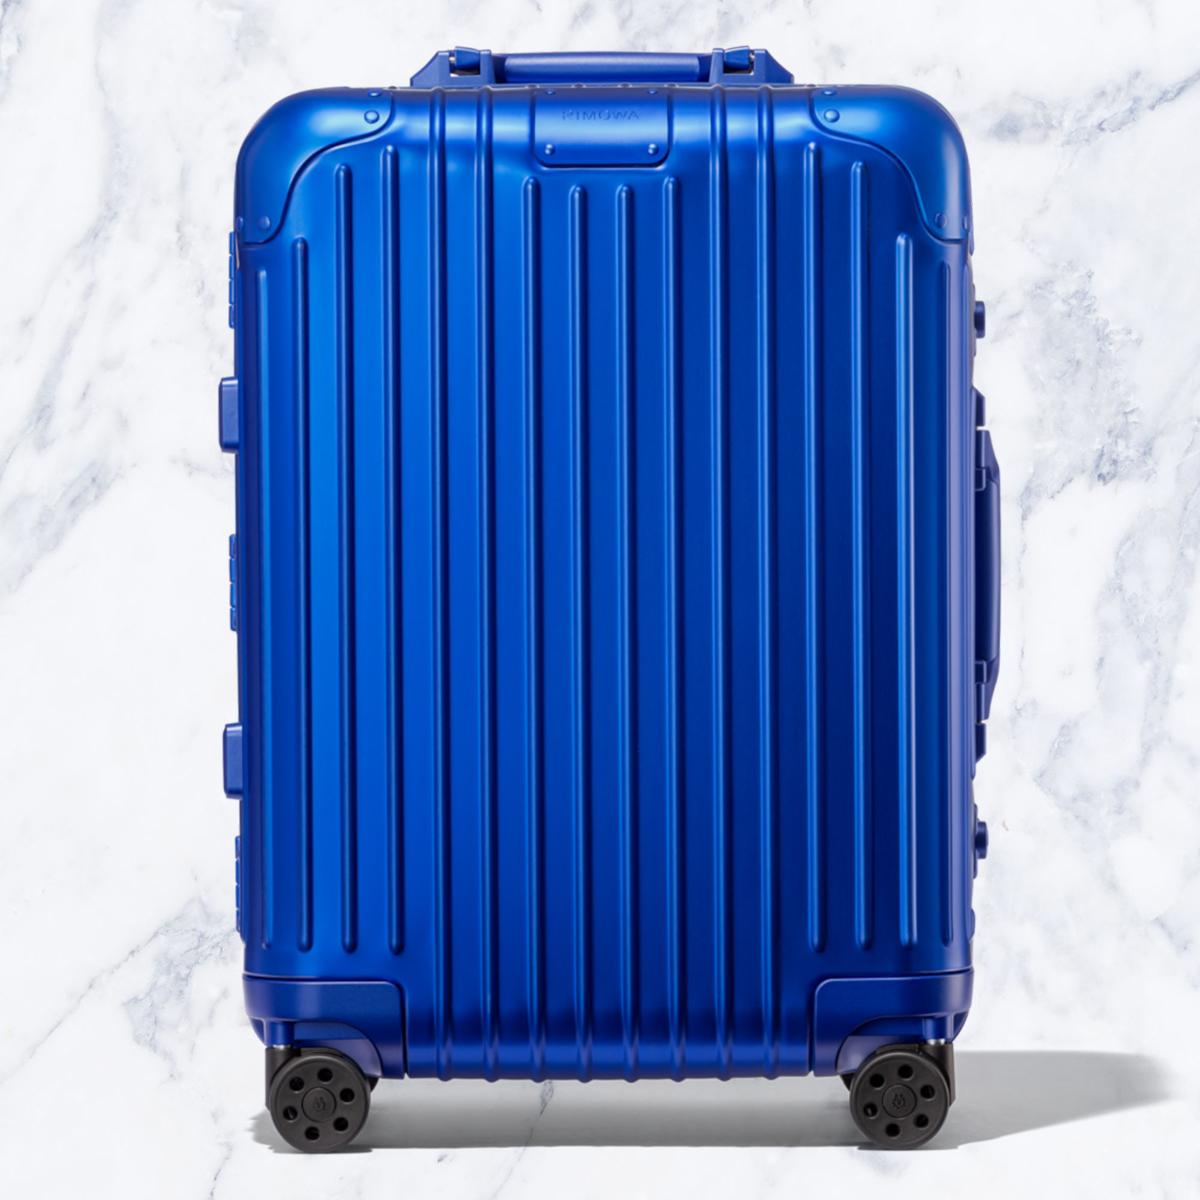 RIMOWA(リモワ)スーツケース リモワ オリジナル 925.53.05.4 キャビン 35リットル 4輪画像